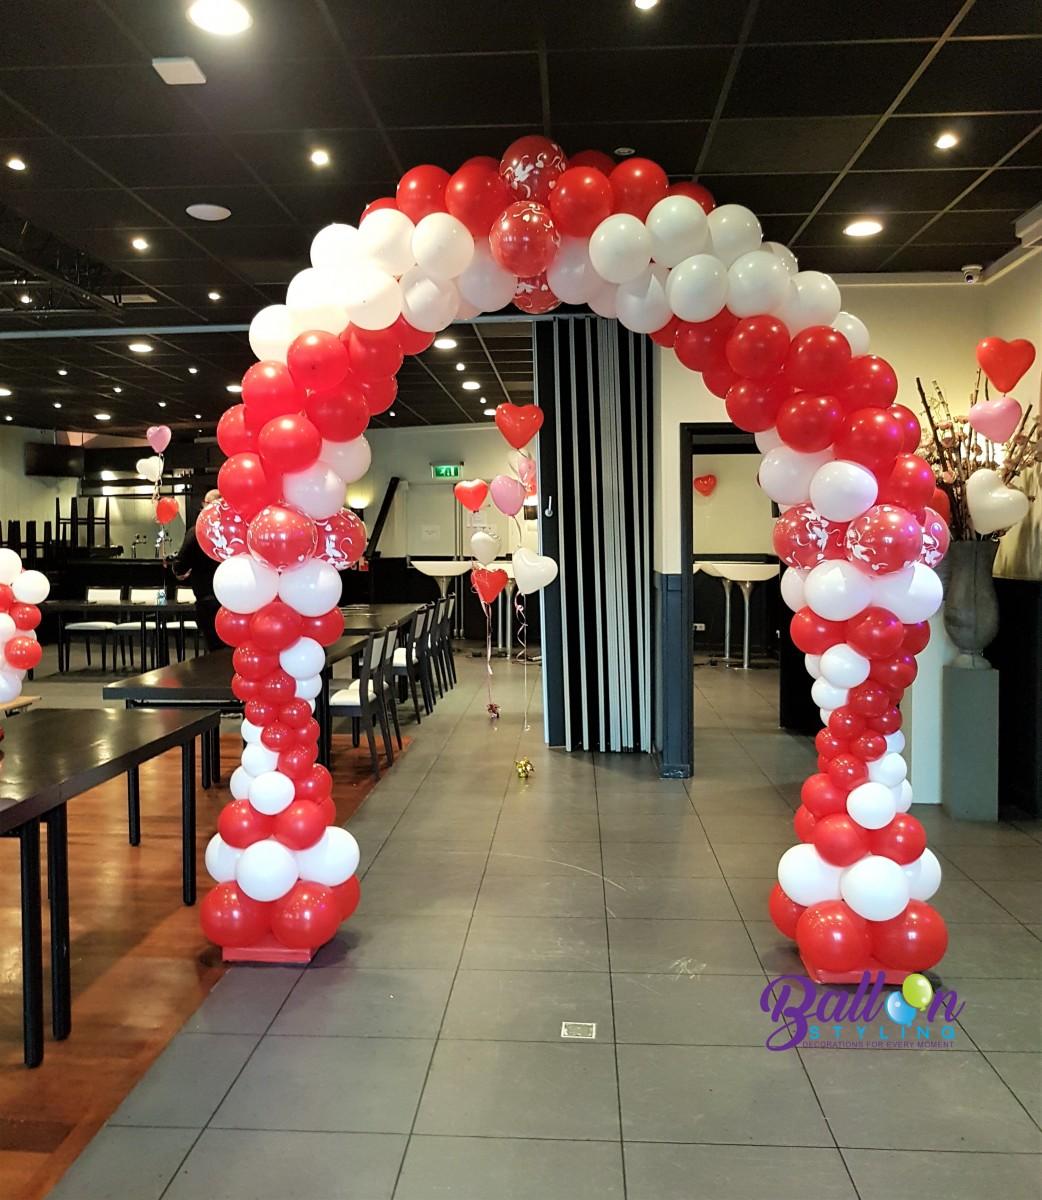 Balloon Styling Tilburg ballonnenboog love doves huwelijk trouwerij ballonnen Tilburg (1)